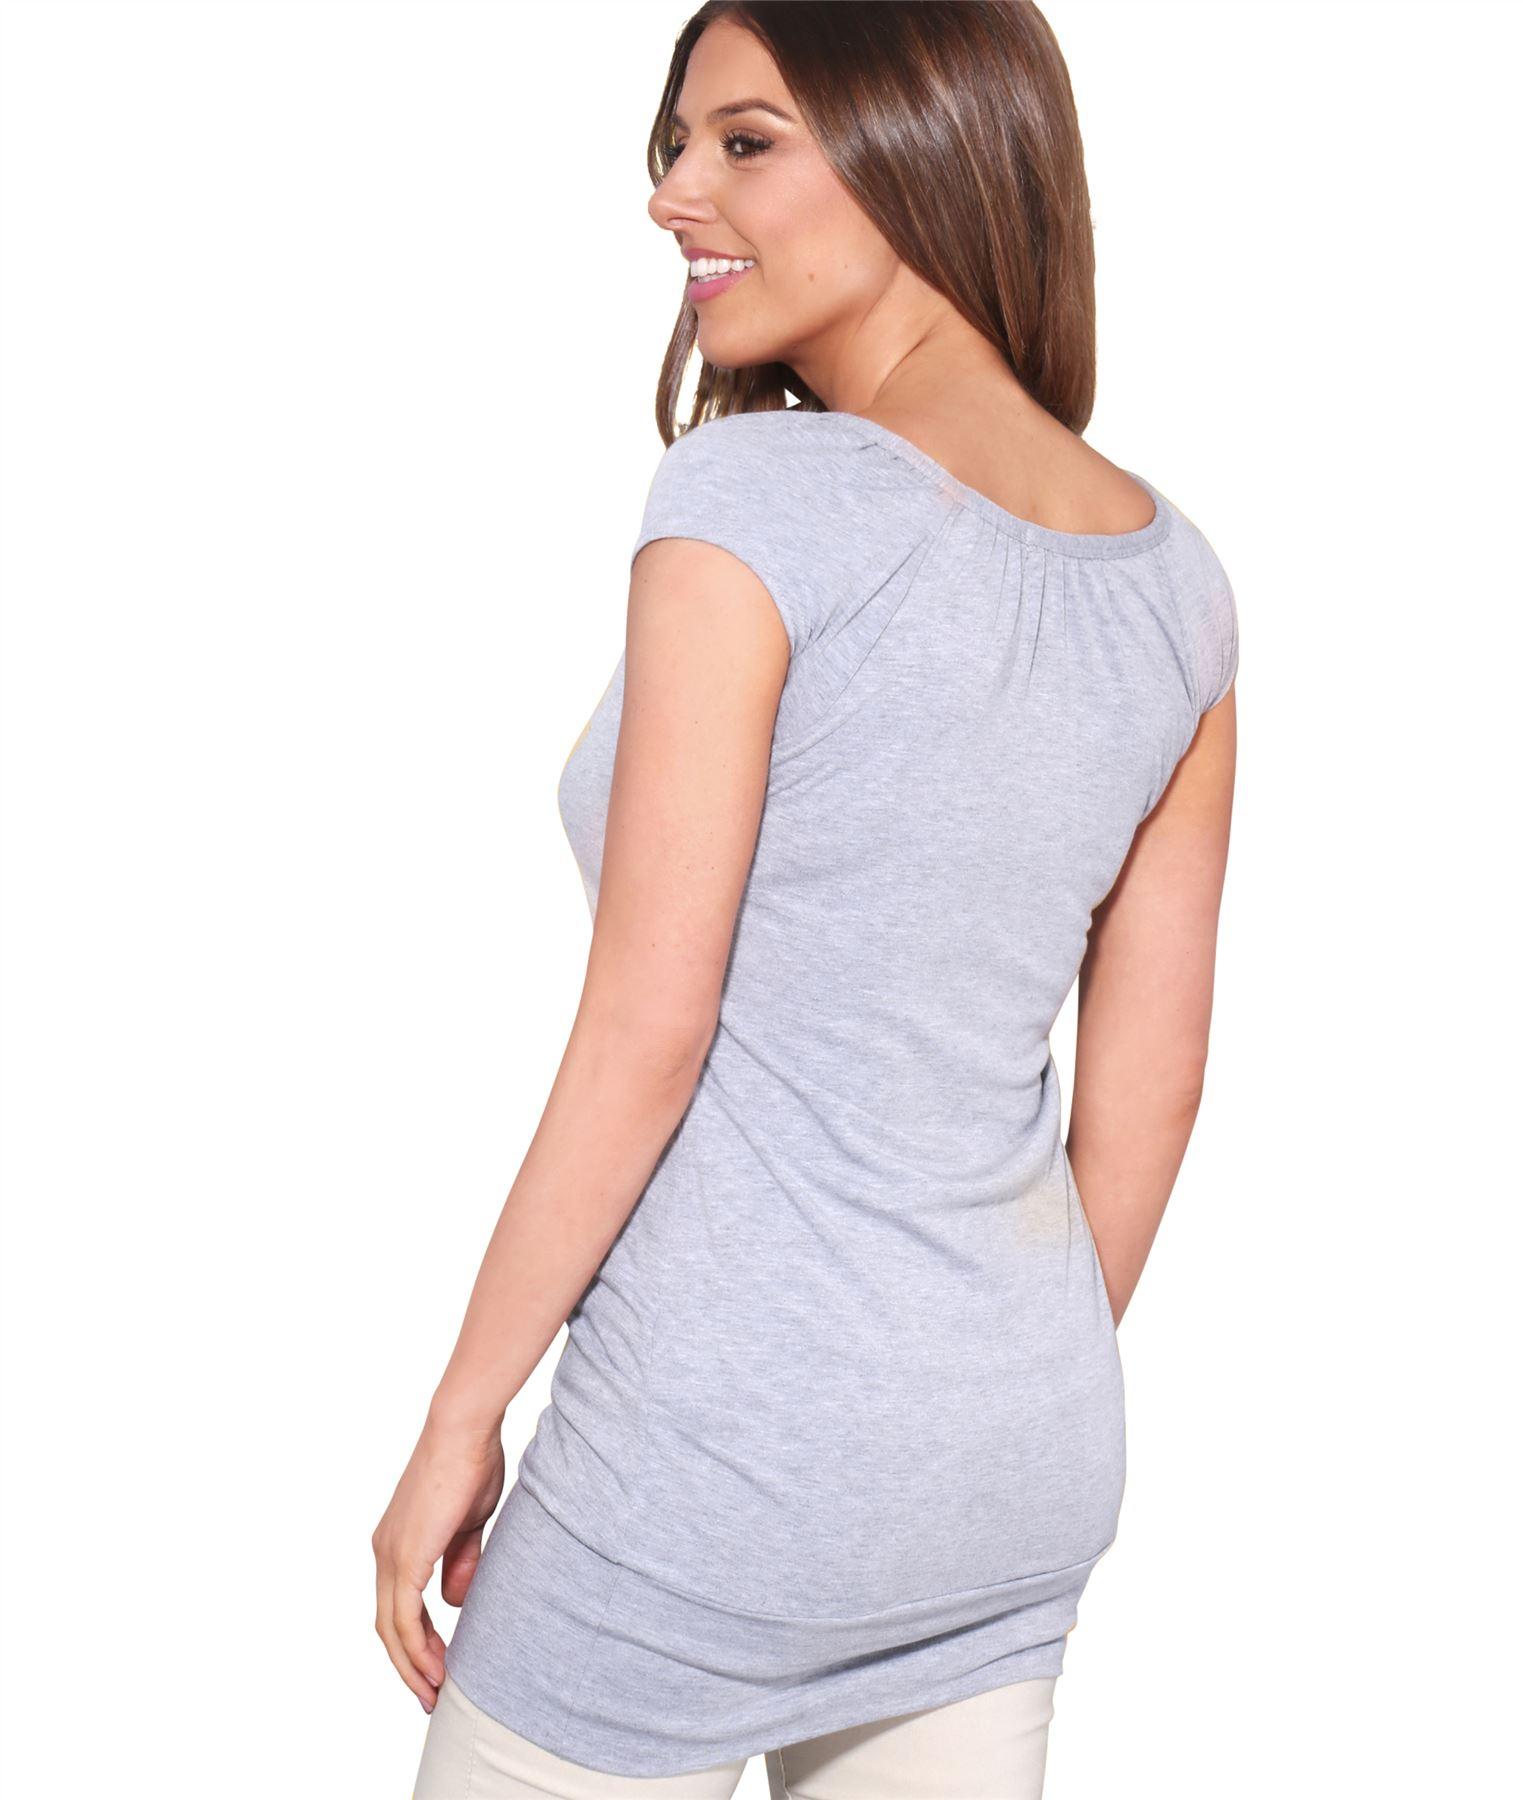 Womens-Ladies-Plain-T-Shirt-Short-Sleeve-Long-Loose-V-Neck-Blouse-Tunic-Top thumbnail 20